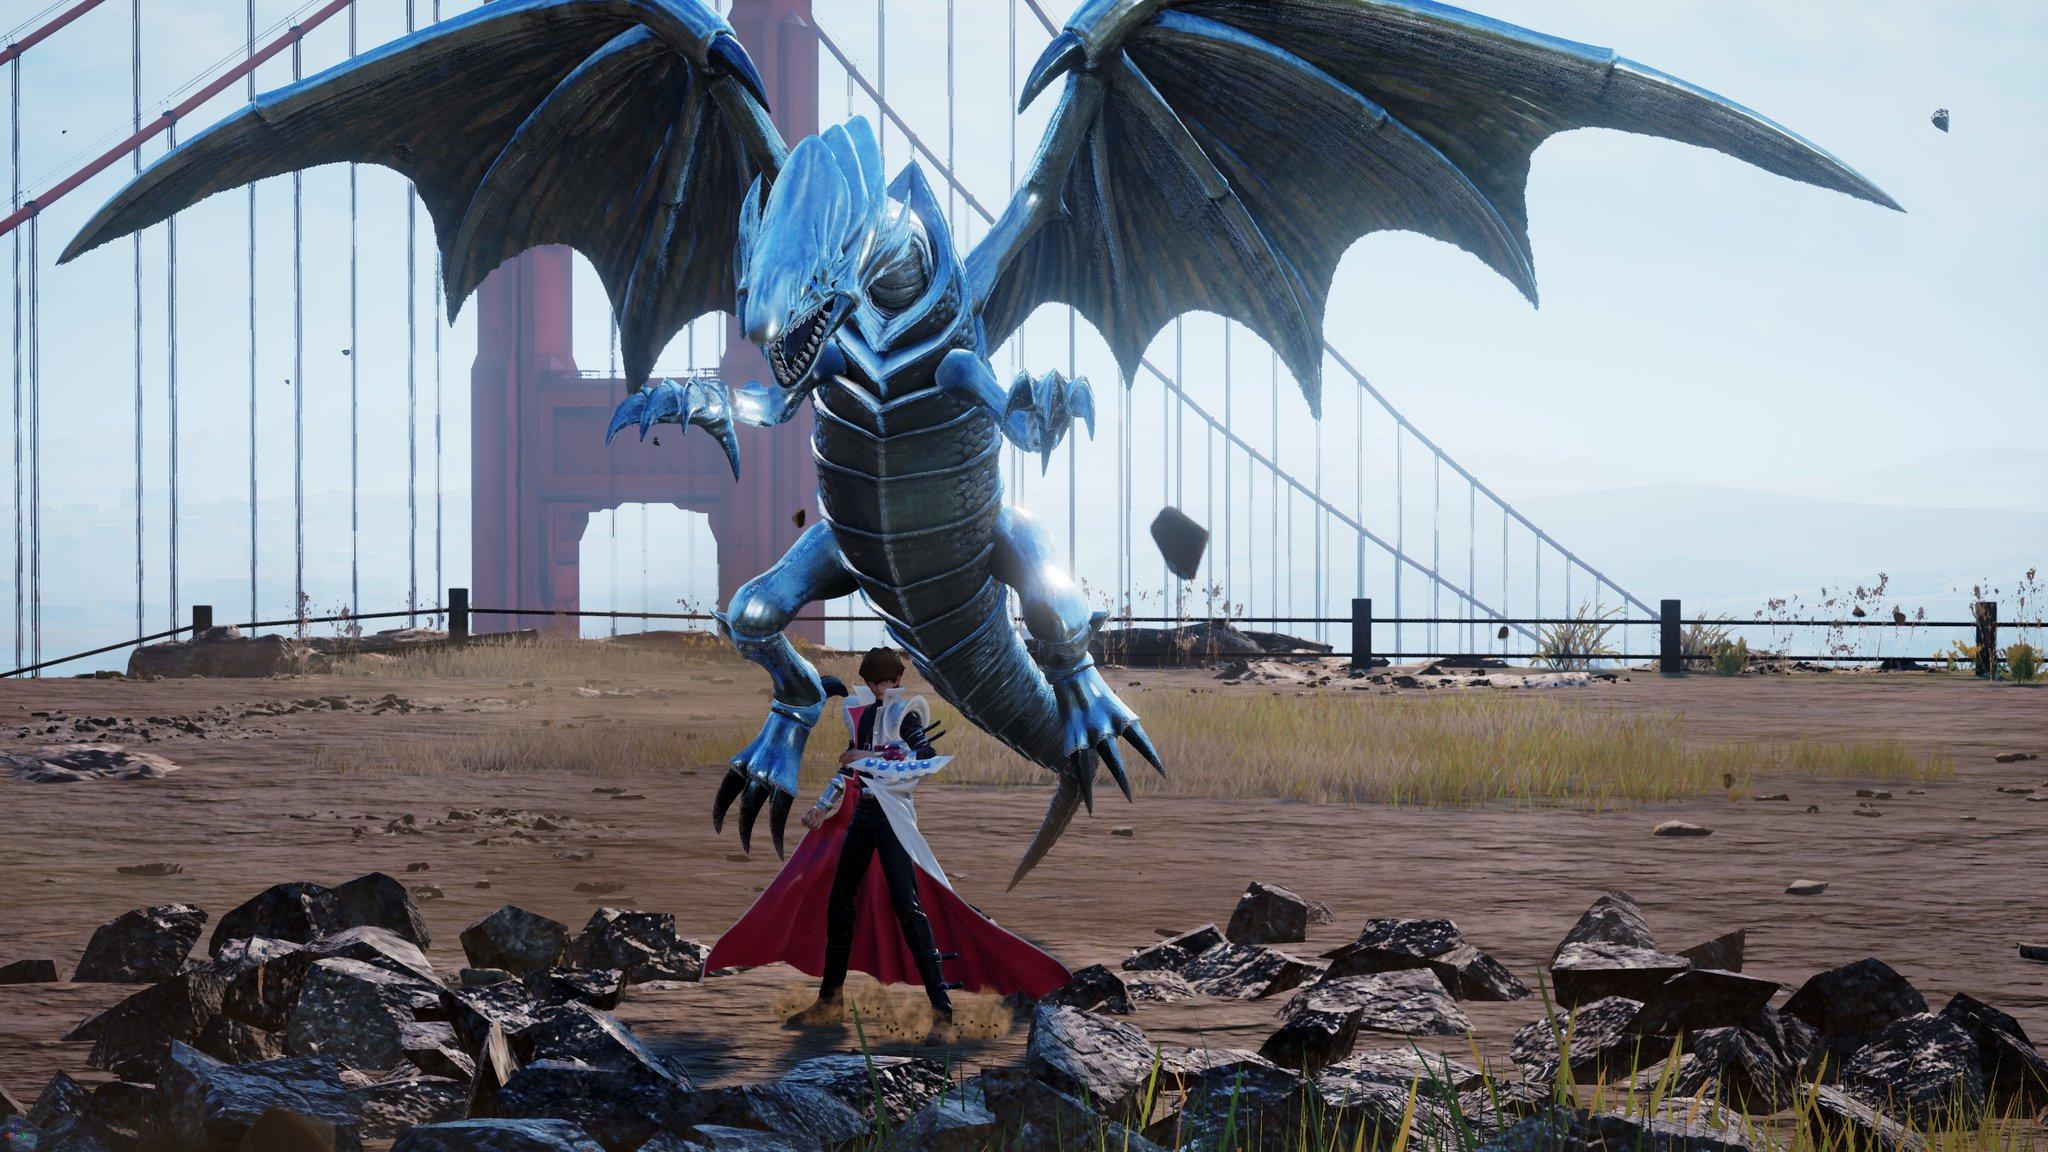 Obelisk the Tormentor Ultimate Yugioh Seto Kaiba Blue-Eyes White Dragon Deck